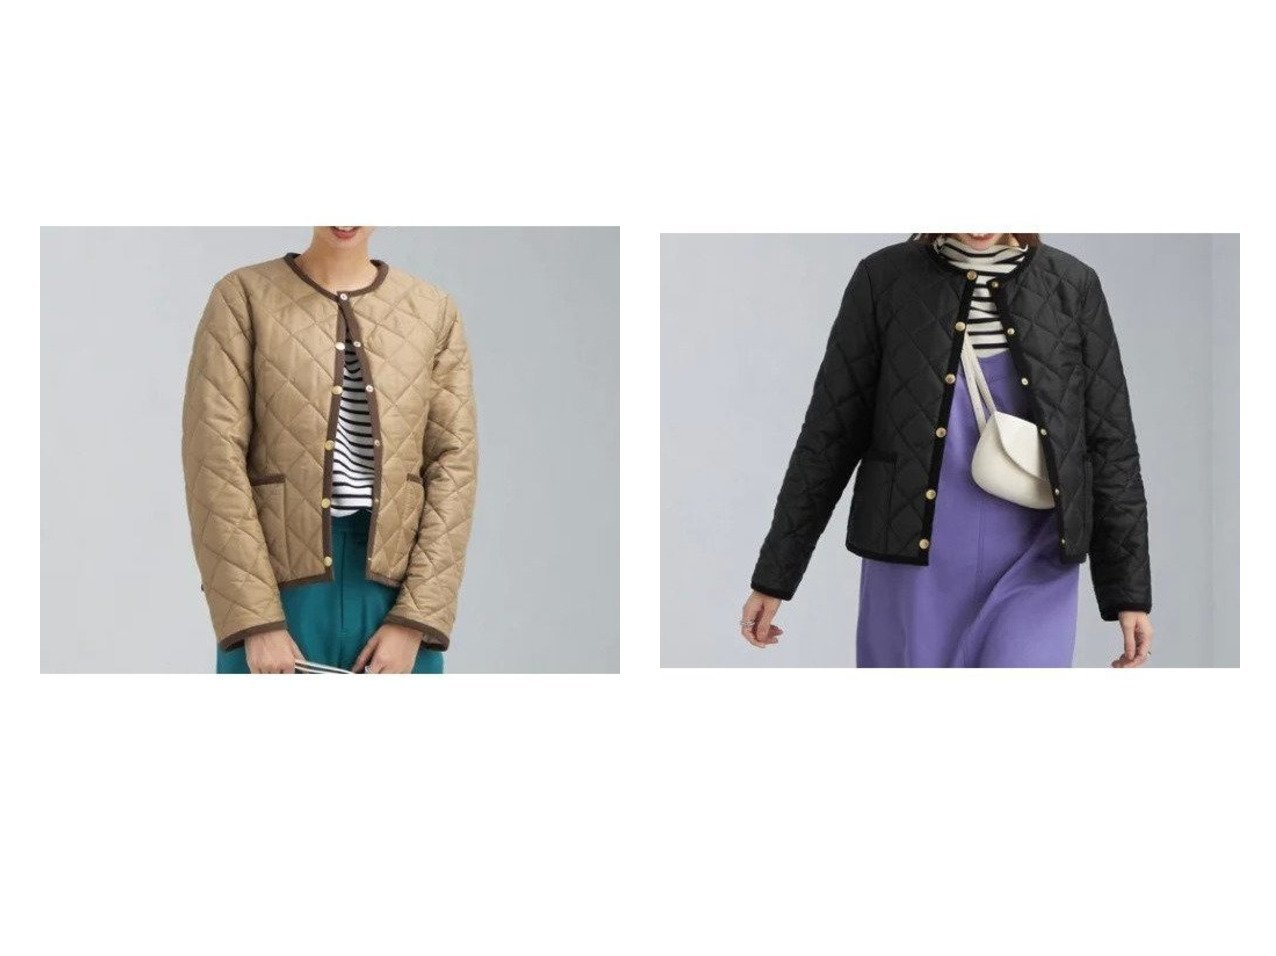 【green label relaxing / UNITED ARROWS/グリーンレーベル リラクシング / ユナイテッドアローズ】の【別注】 ARKLEY ショート コート 【アウター】おすすめ!人気、トレンド・レディースファッションの通販 おすすめで人気の流行・トレンド、ファッションの通販商品 インテリア・家具・メンズファッション・キッズファッション・レディースファッション・服の通販 founy(ファニー) https://founy.com/ ファッション Fashion レディースファッション WOMEN アウター Coat Outerwear コート Coats コレクション ショート シンプル 別注 ロング  ID:crp329100000074436